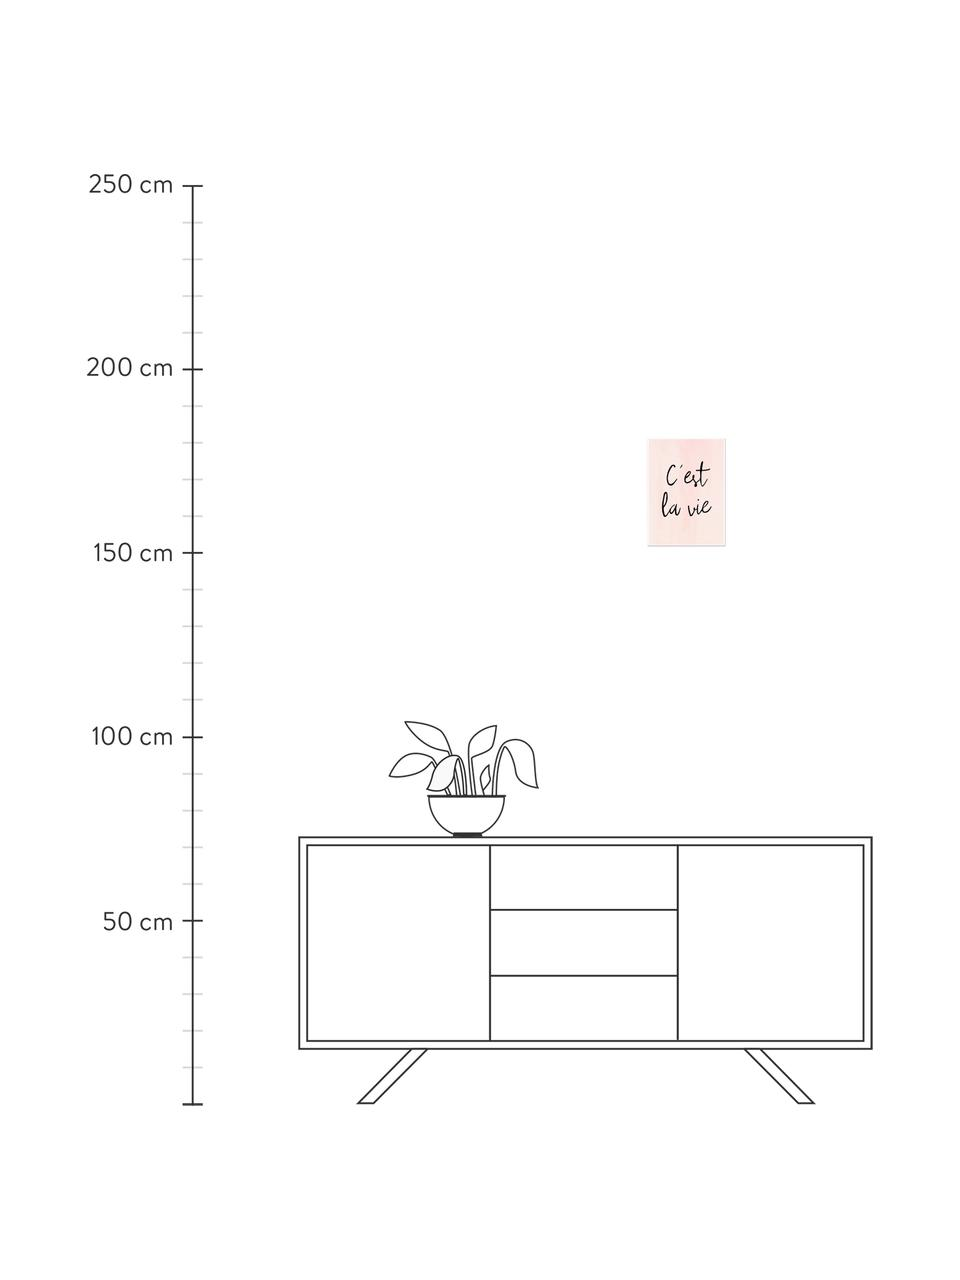 Poster C'est La Vie, Digitaldruck auf Papier, 200 g/m², Rosa, Schwarz, 30 x 42 cm